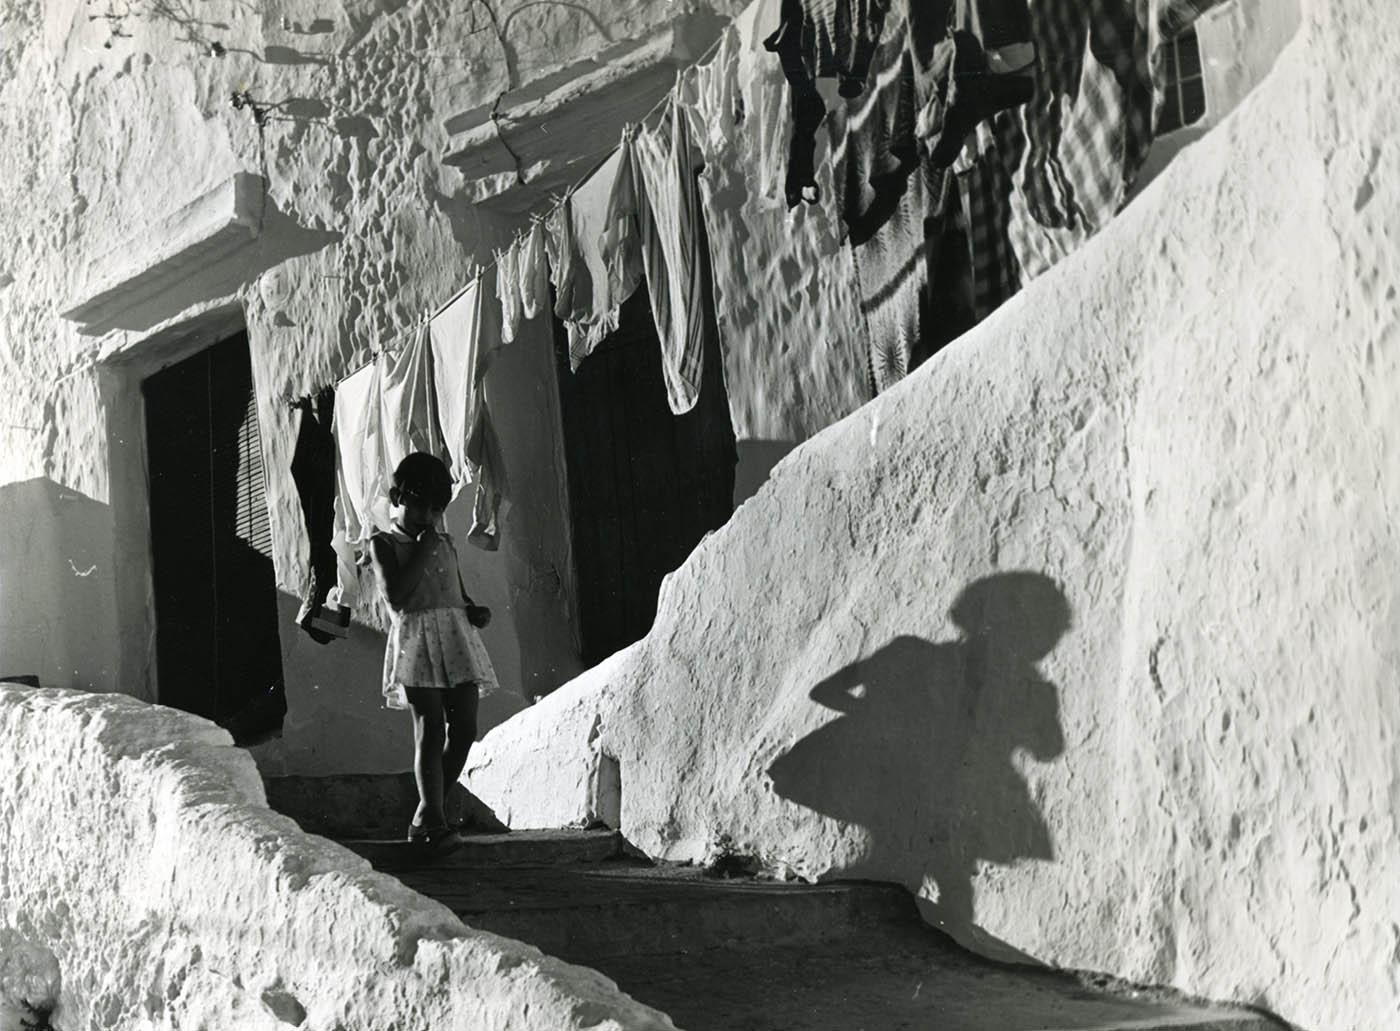 Casares, década de 1960 (Fotografía: Manuel Fdez. Mota)